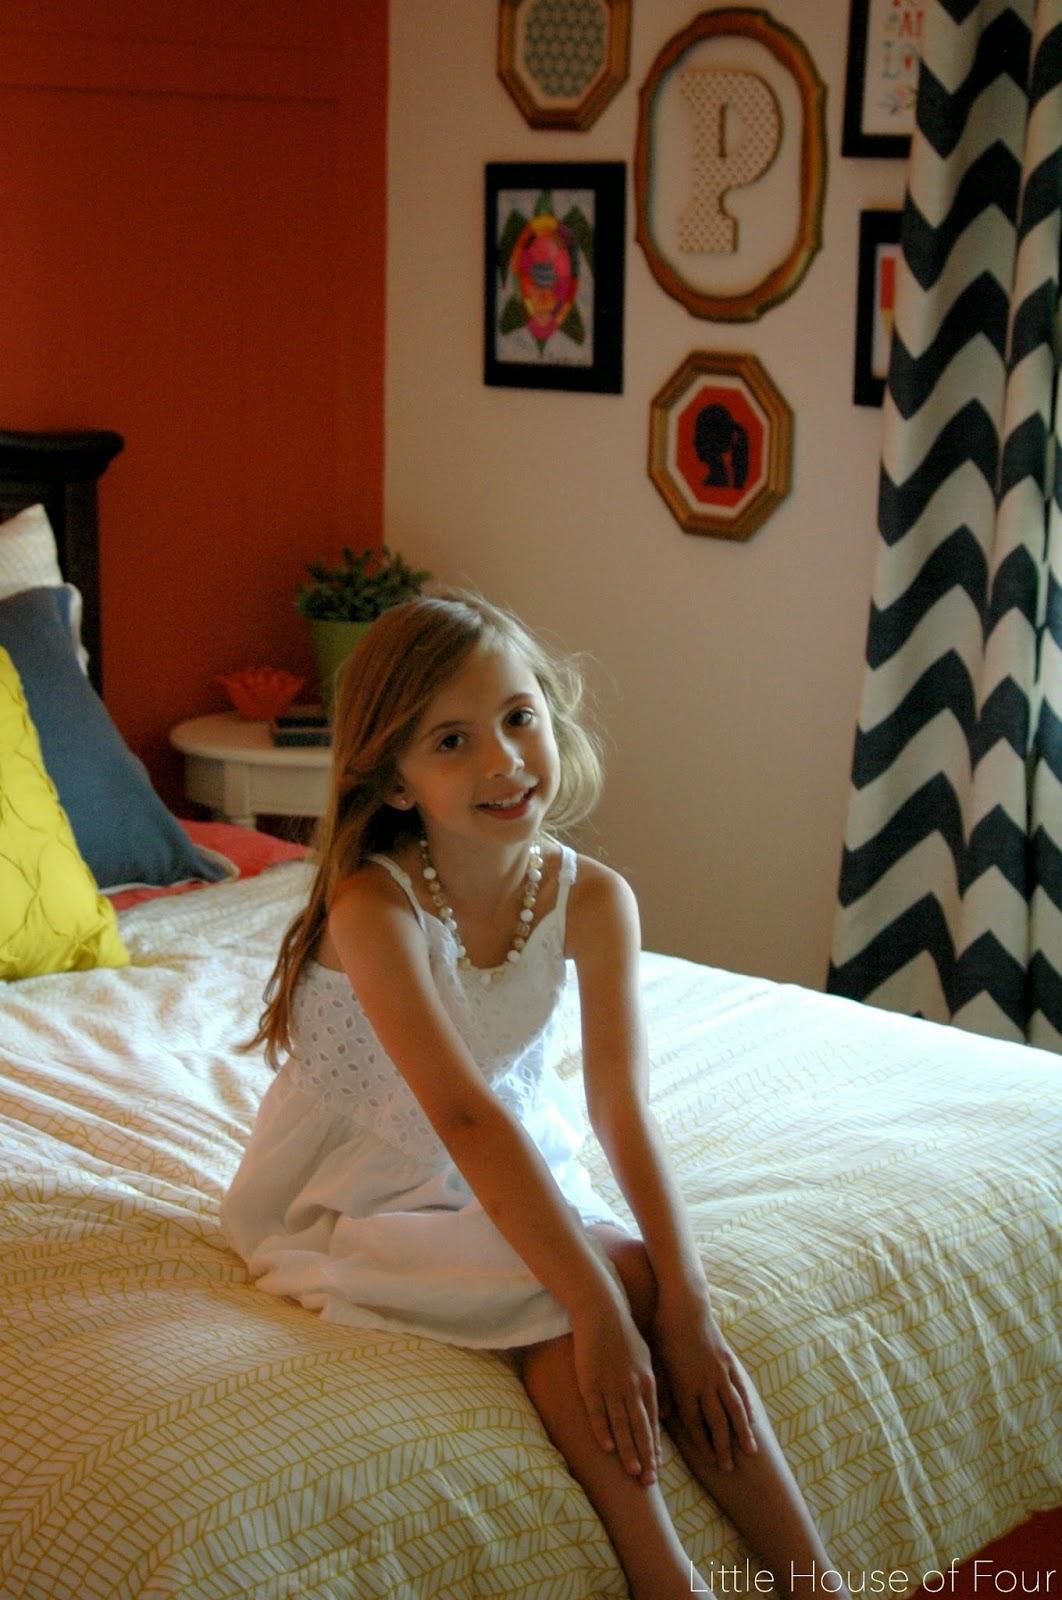 Little girl on her bed